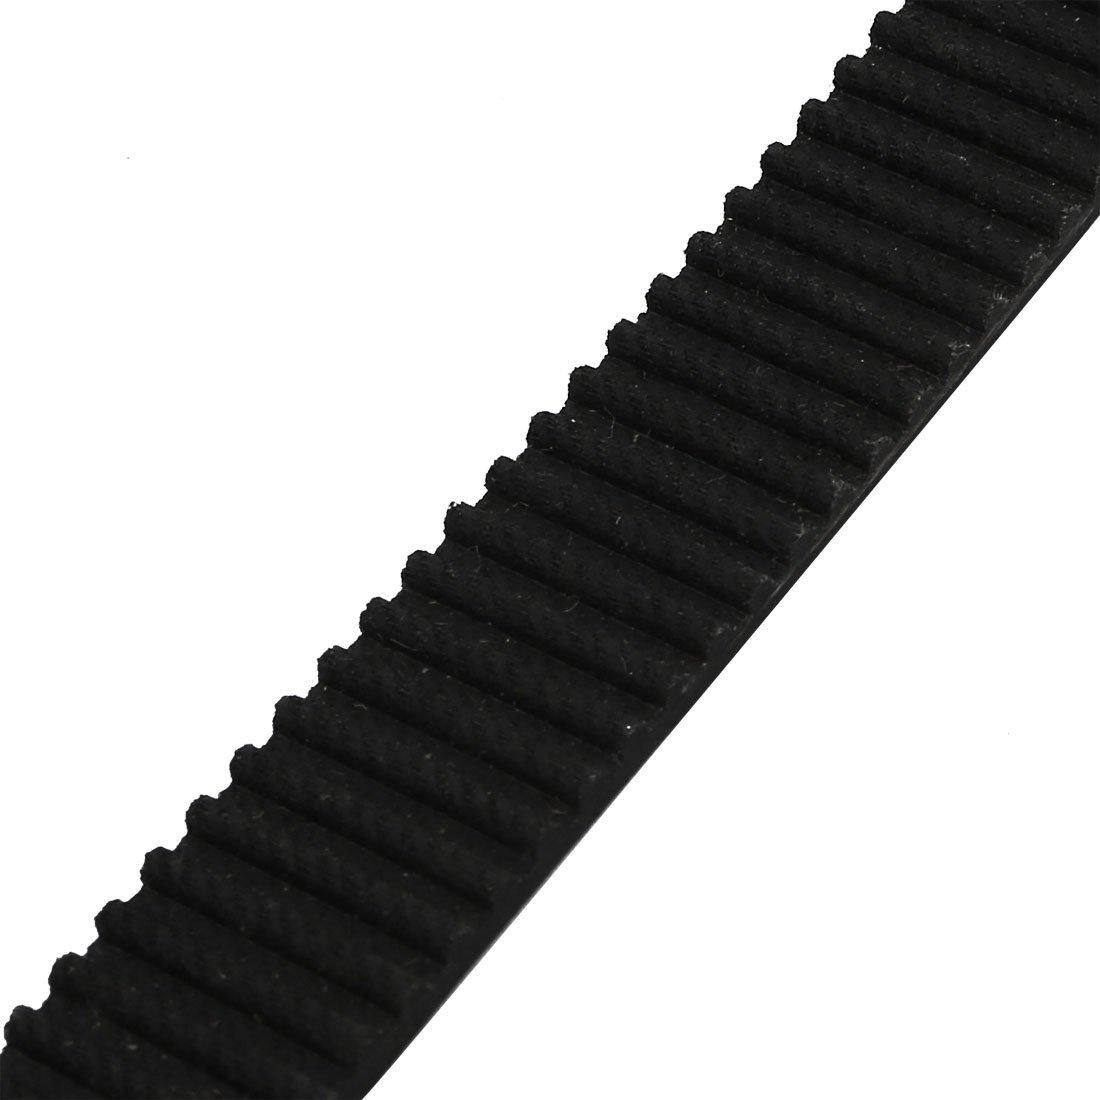 uxcell/® uxcellHTD3M 179 Teeth Stepper Timing Belt Rubber Geared-Belt 537mm Perimeter 15mm Wide